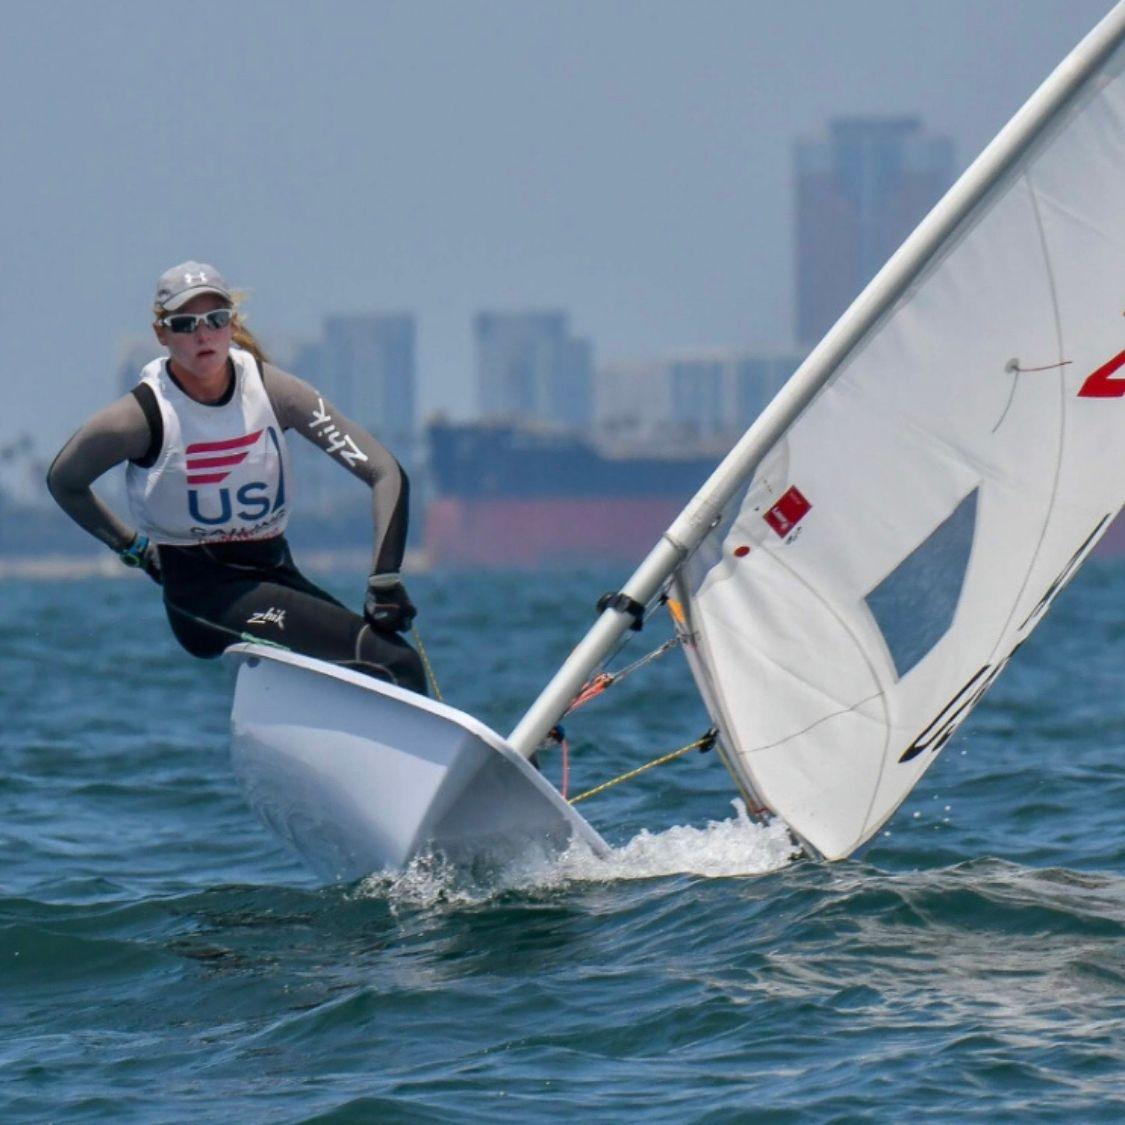 professional sailor hallie schiffman SPT athlete